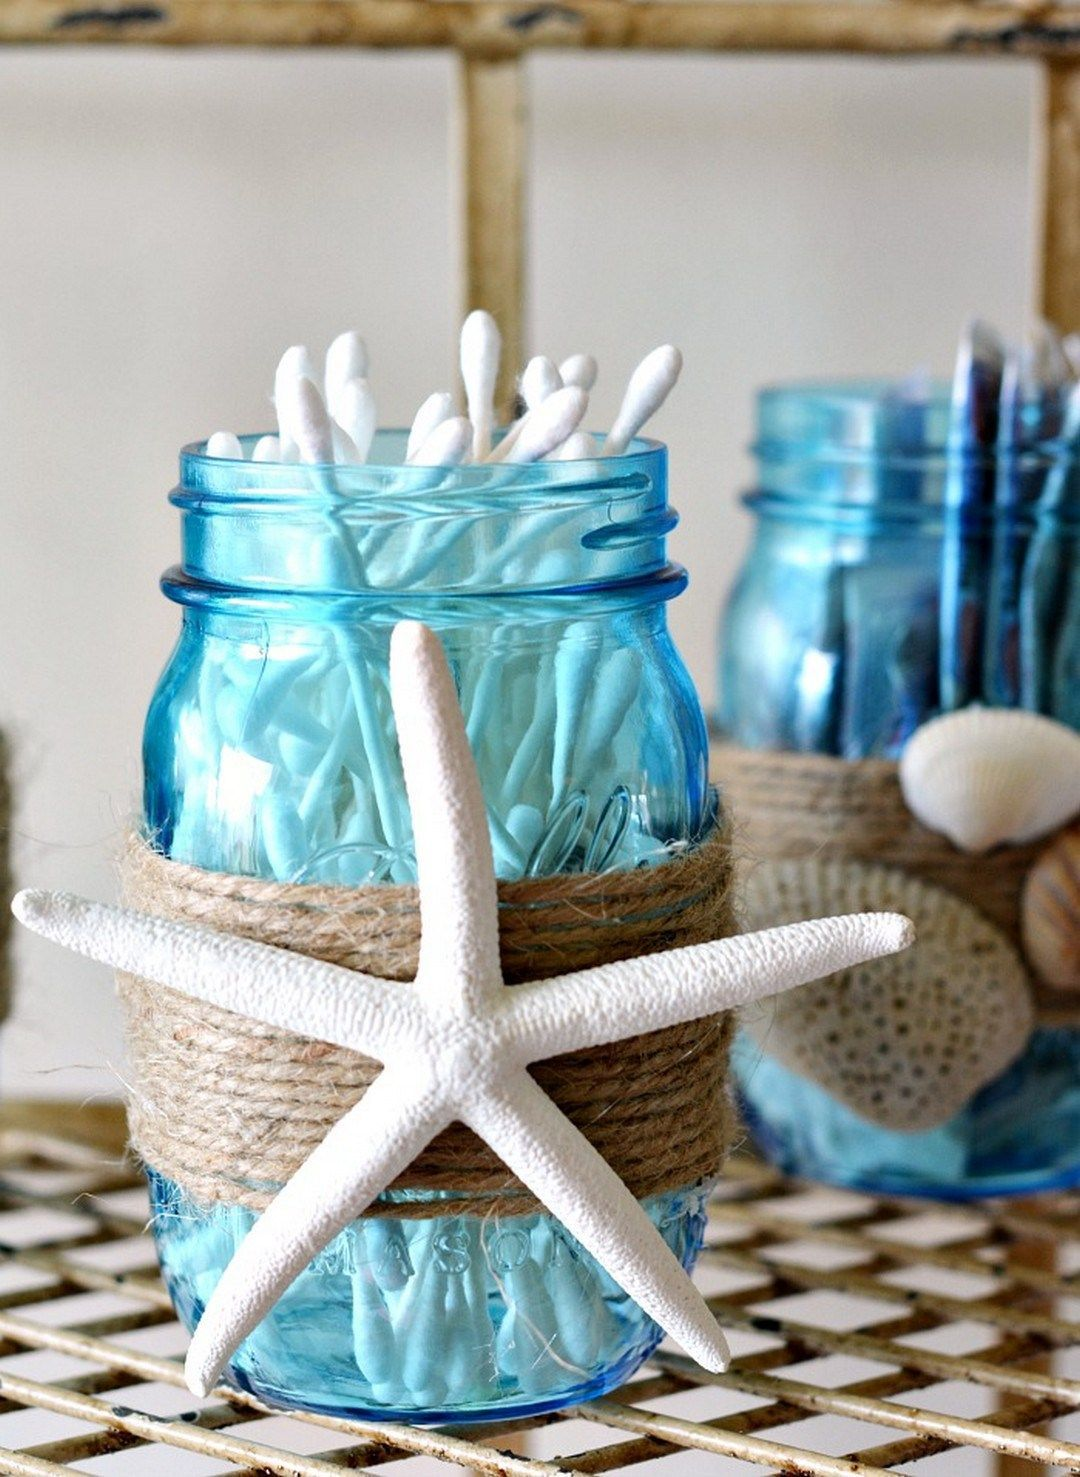 Beach party table decorations  perfect for a beach themed bathroom ideas   beach cottage